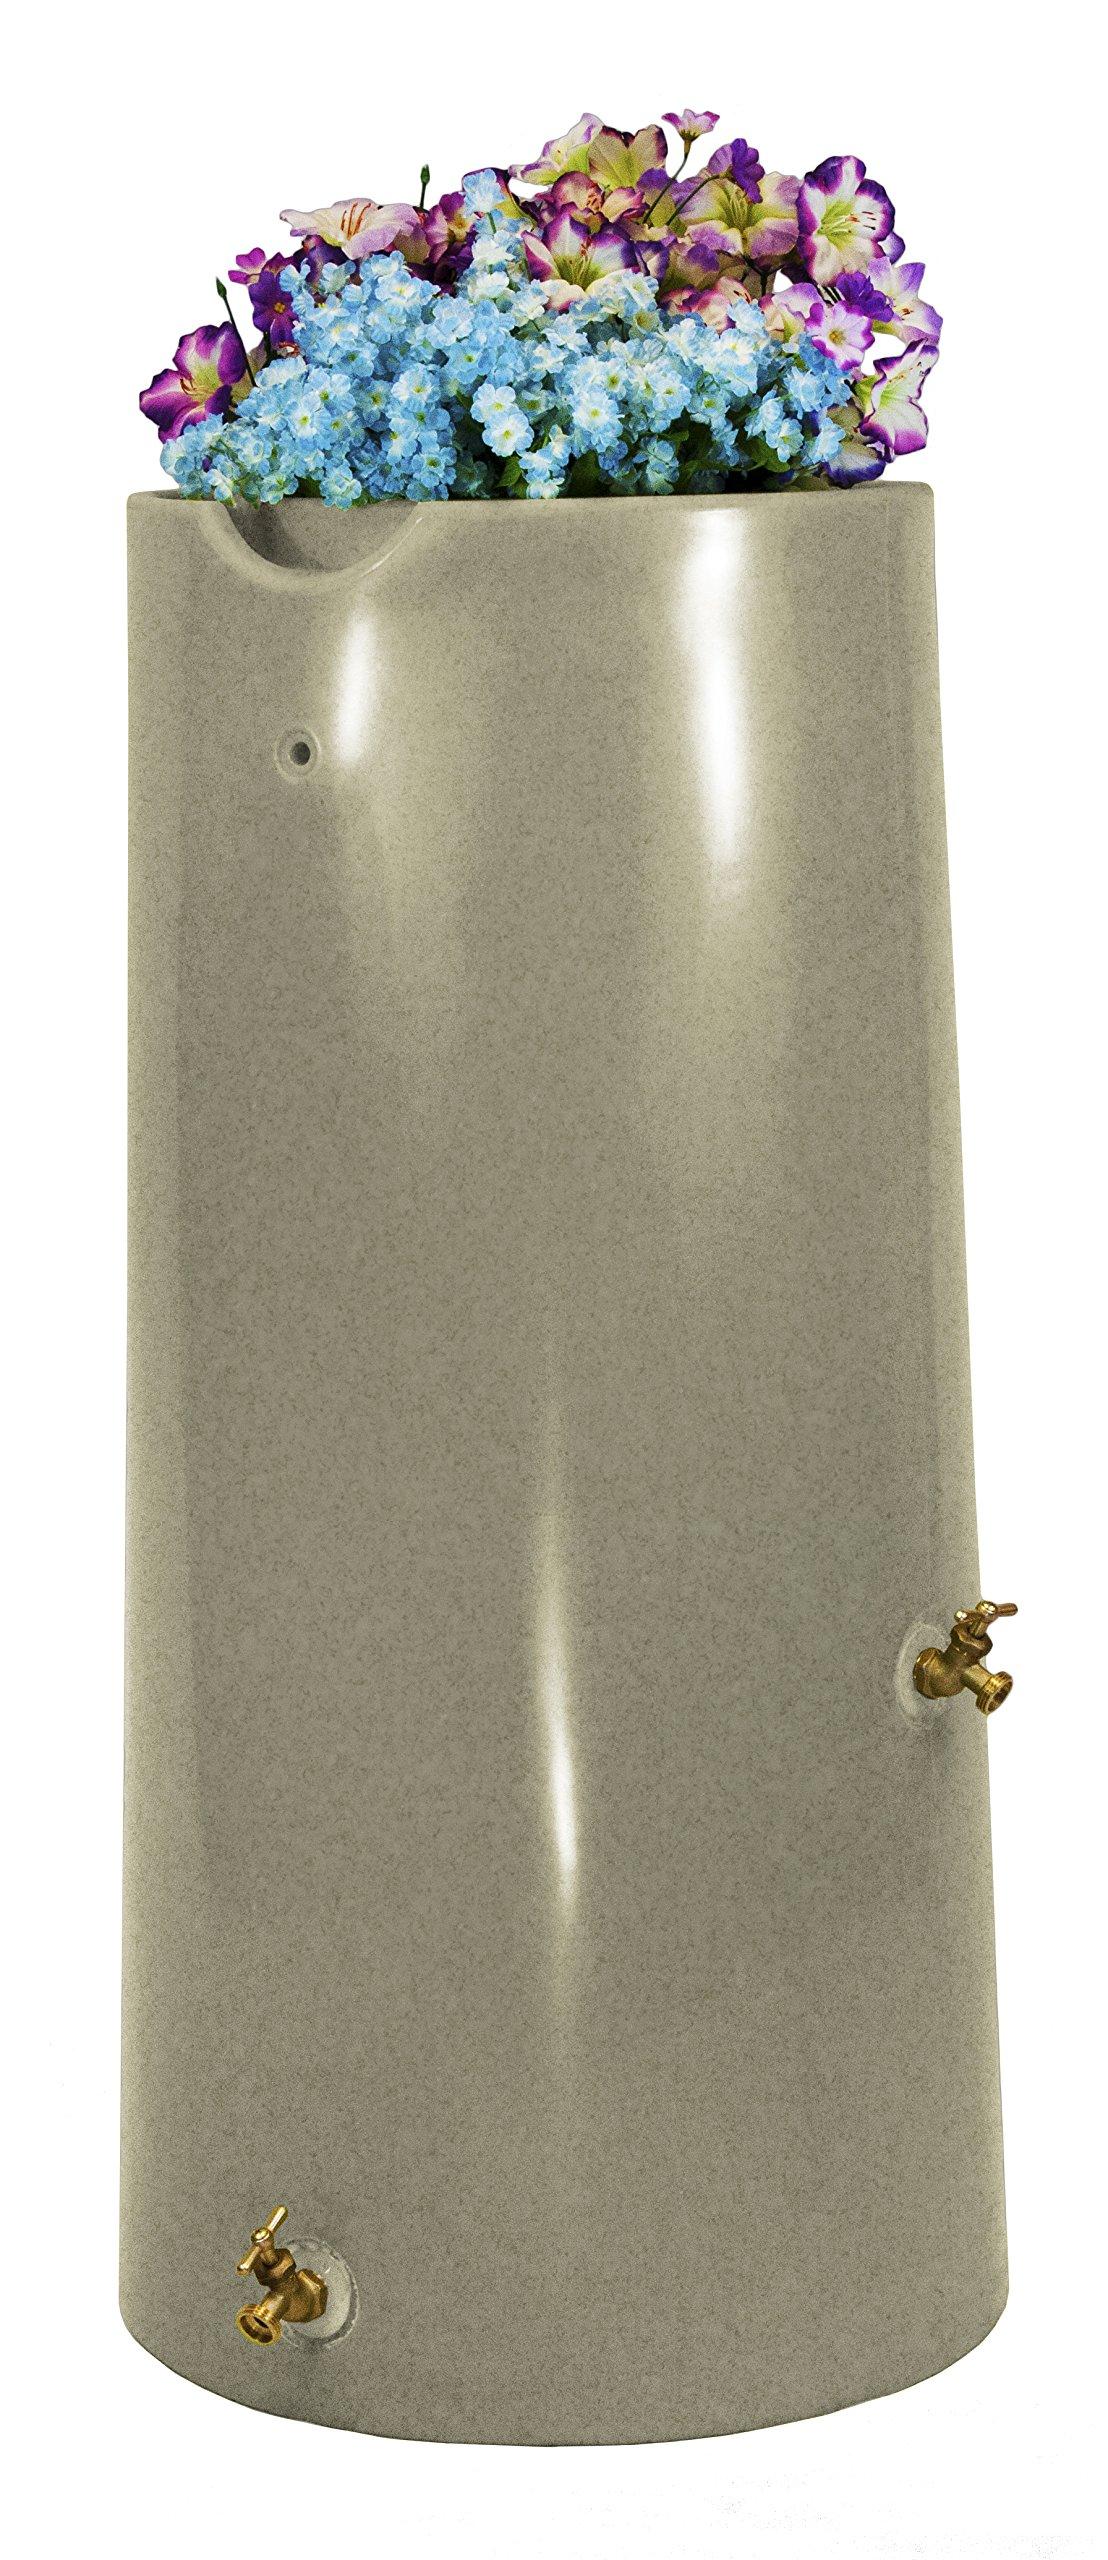 Good Ideas IMP-R50-SAN Impressions Reflections Rain Saver Rain Barrel, 50 Gallon, Sandstone by Good Ideas